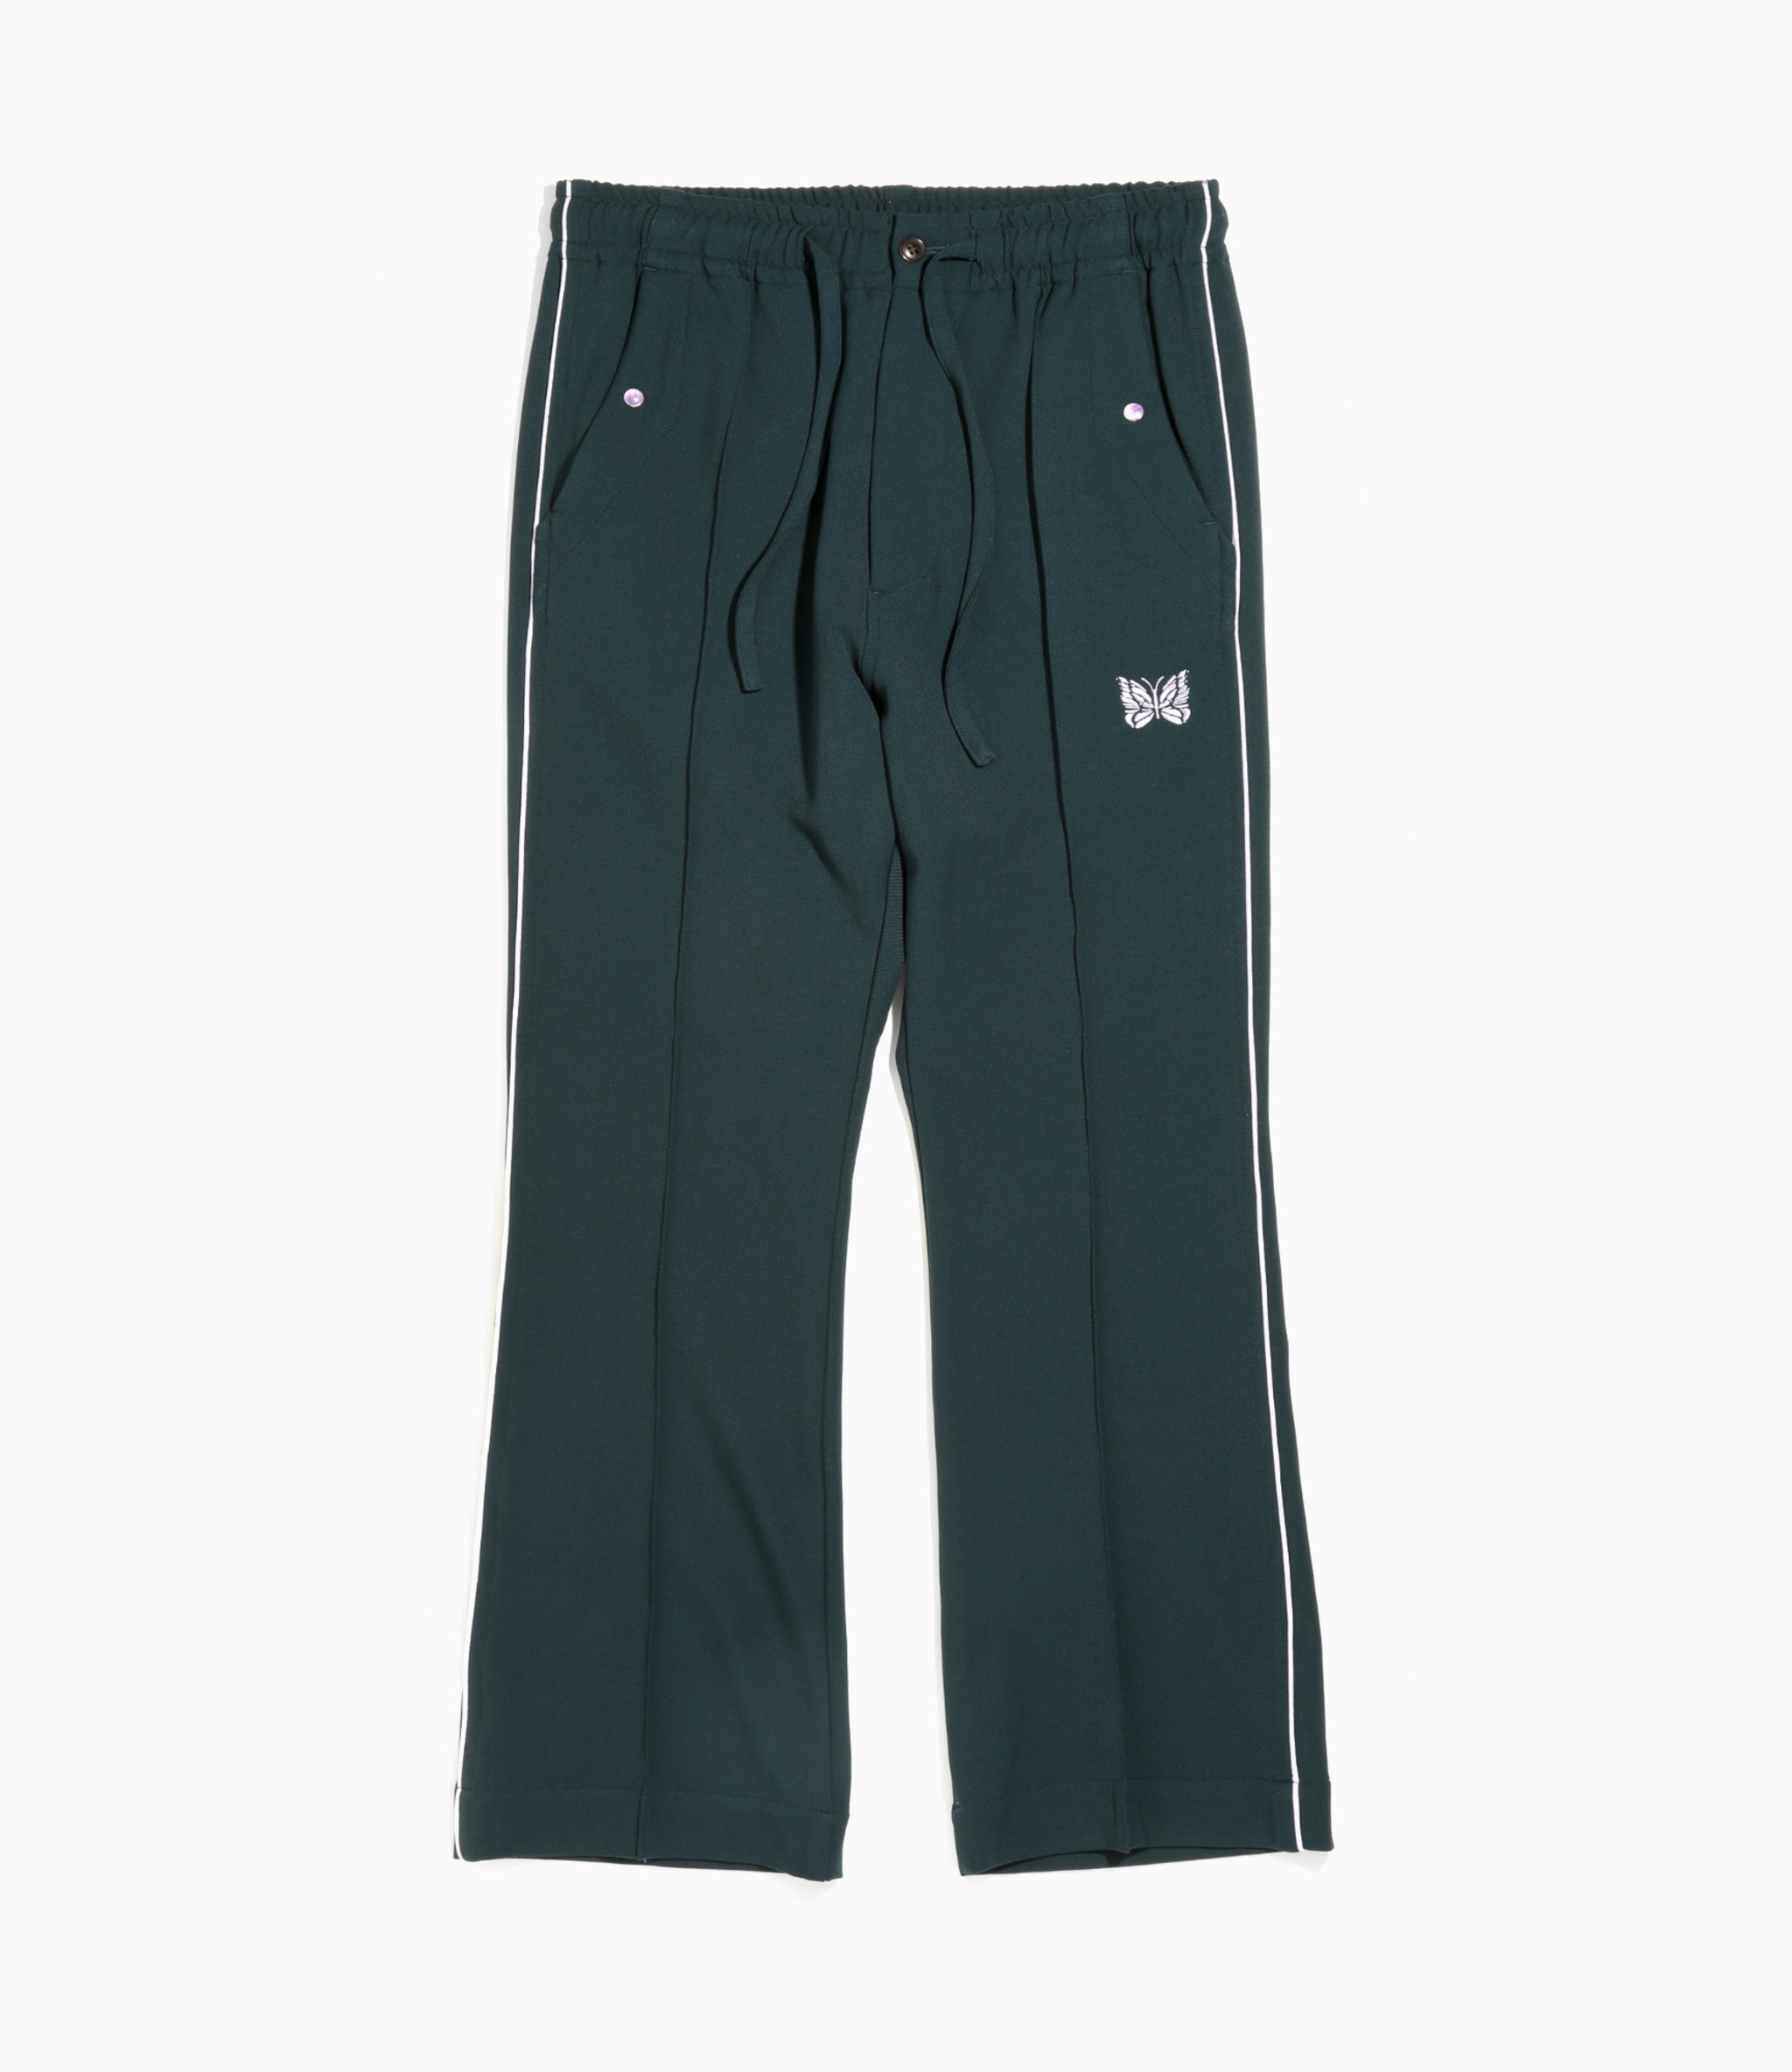 Needles Piping Cowboy Pant - Pe/R/Pu Twill - Green